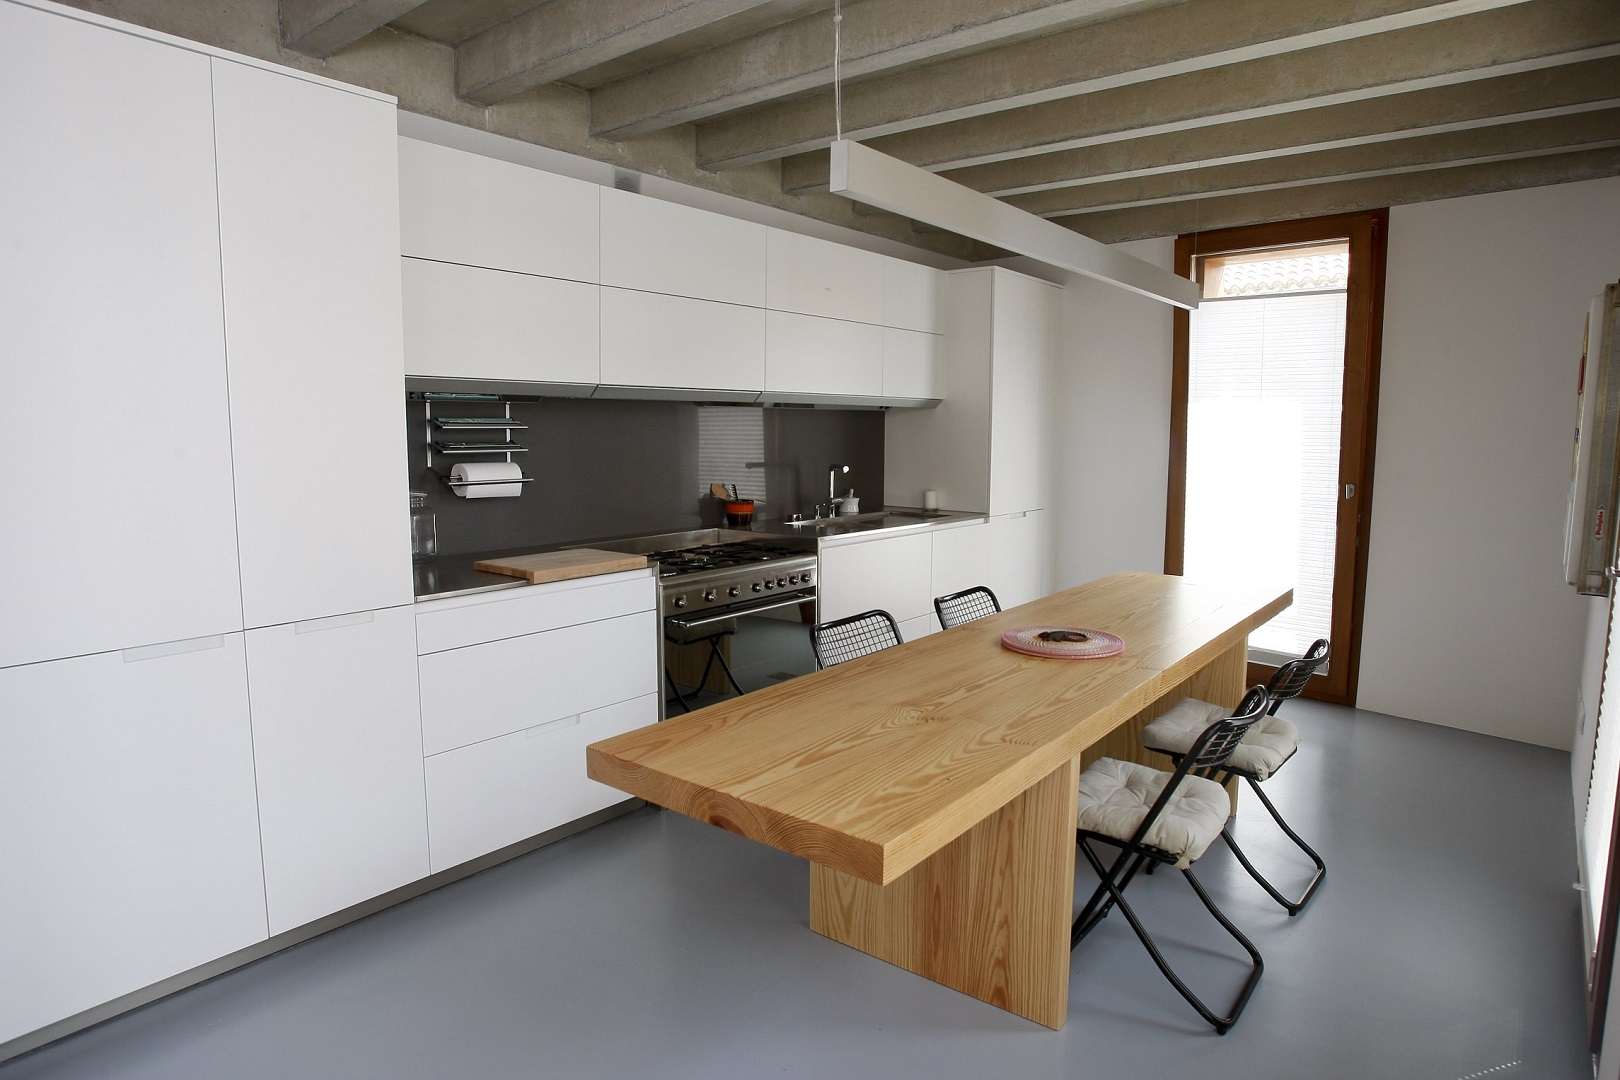 Cocina blanca con comedor Santiago Interiores